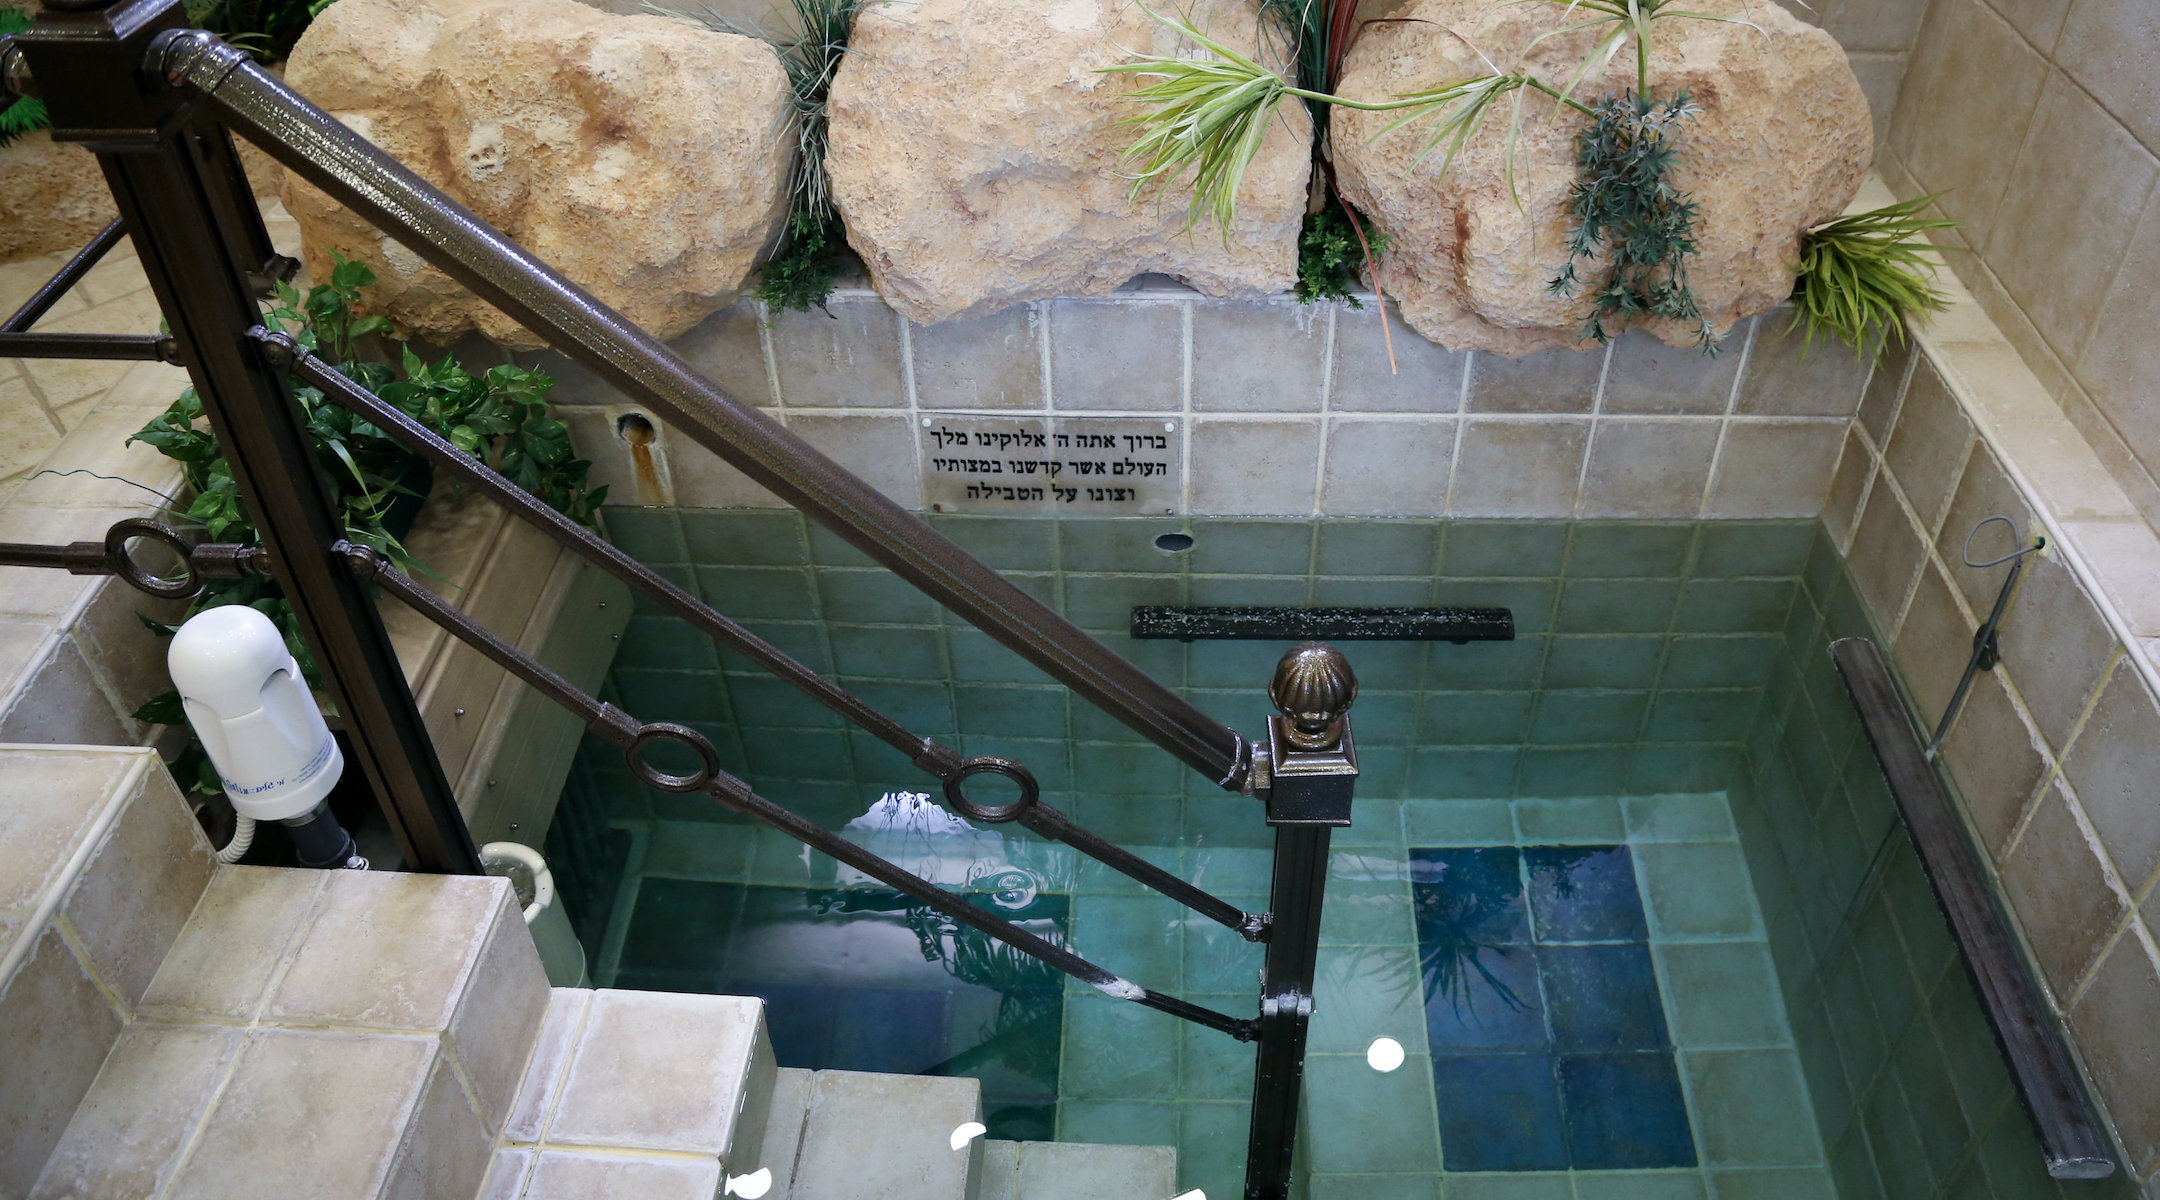 Modern-day mikveh (ritual bath) for purification of women